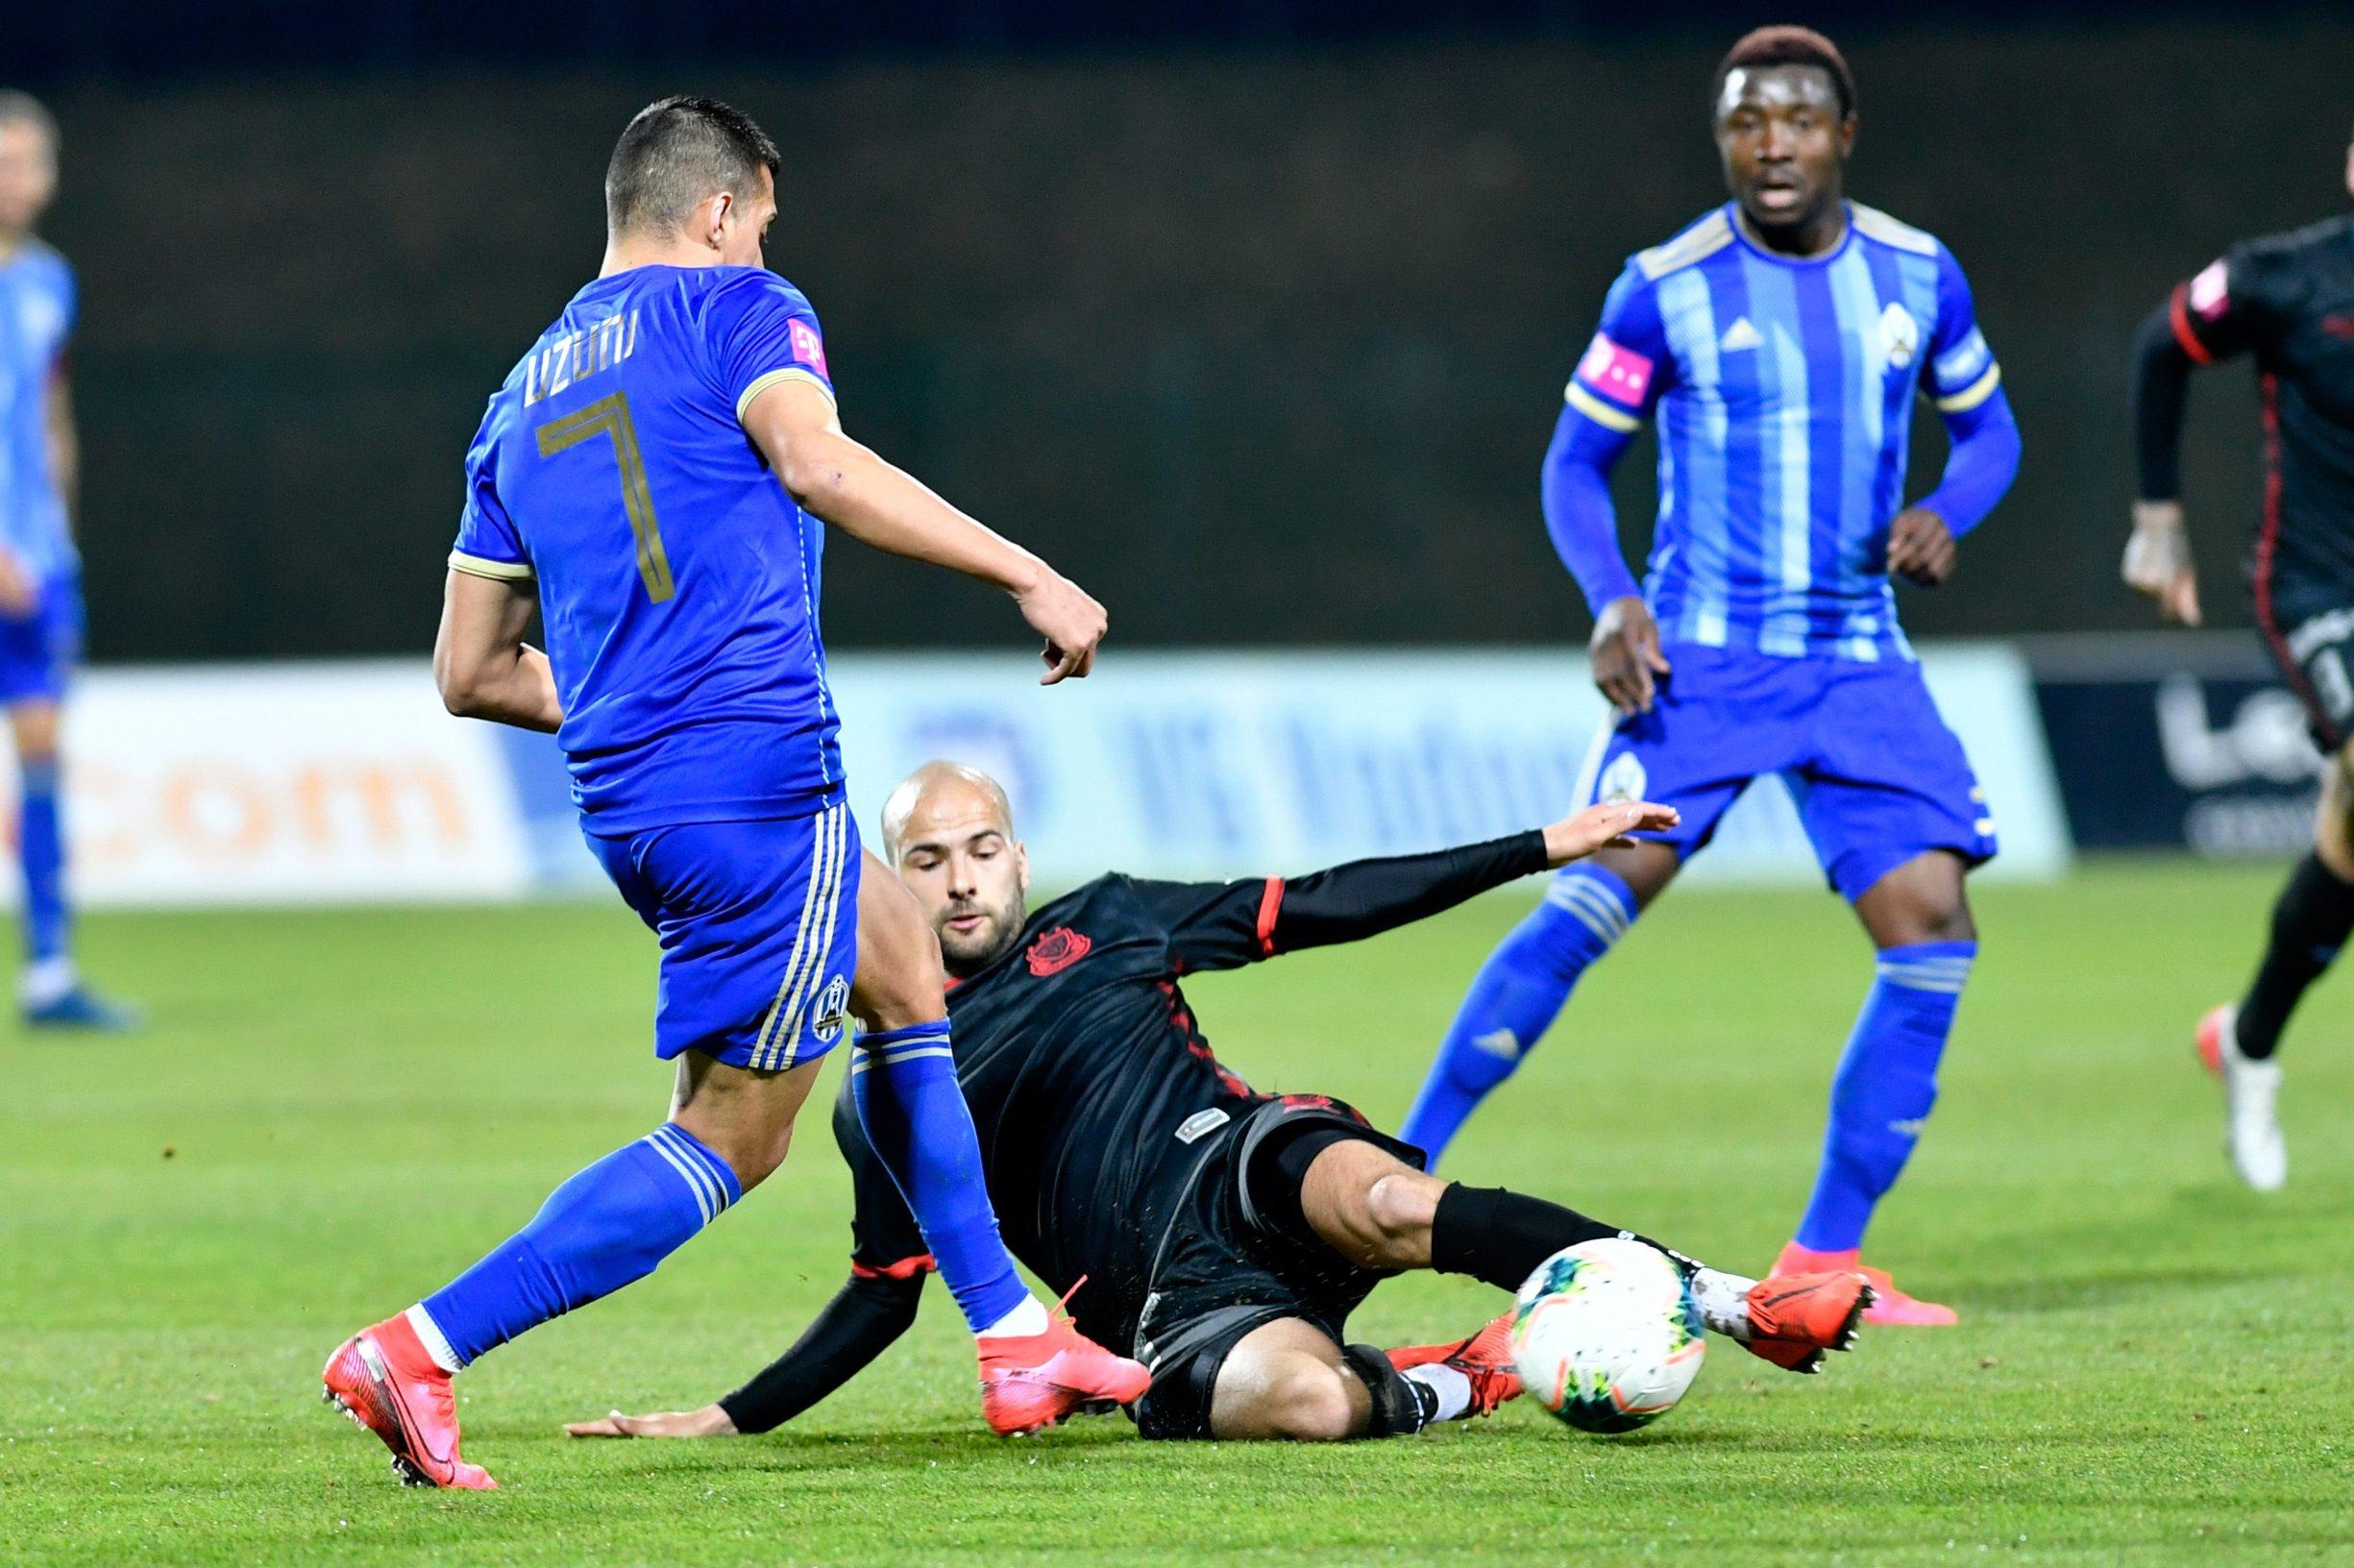 Velika Gorica, 090320.  Gradski stadion. Utakmica 26. kola Prve HNL, Gorica - Lokomotiva. Foto: Goran Mehkek / CROPIX